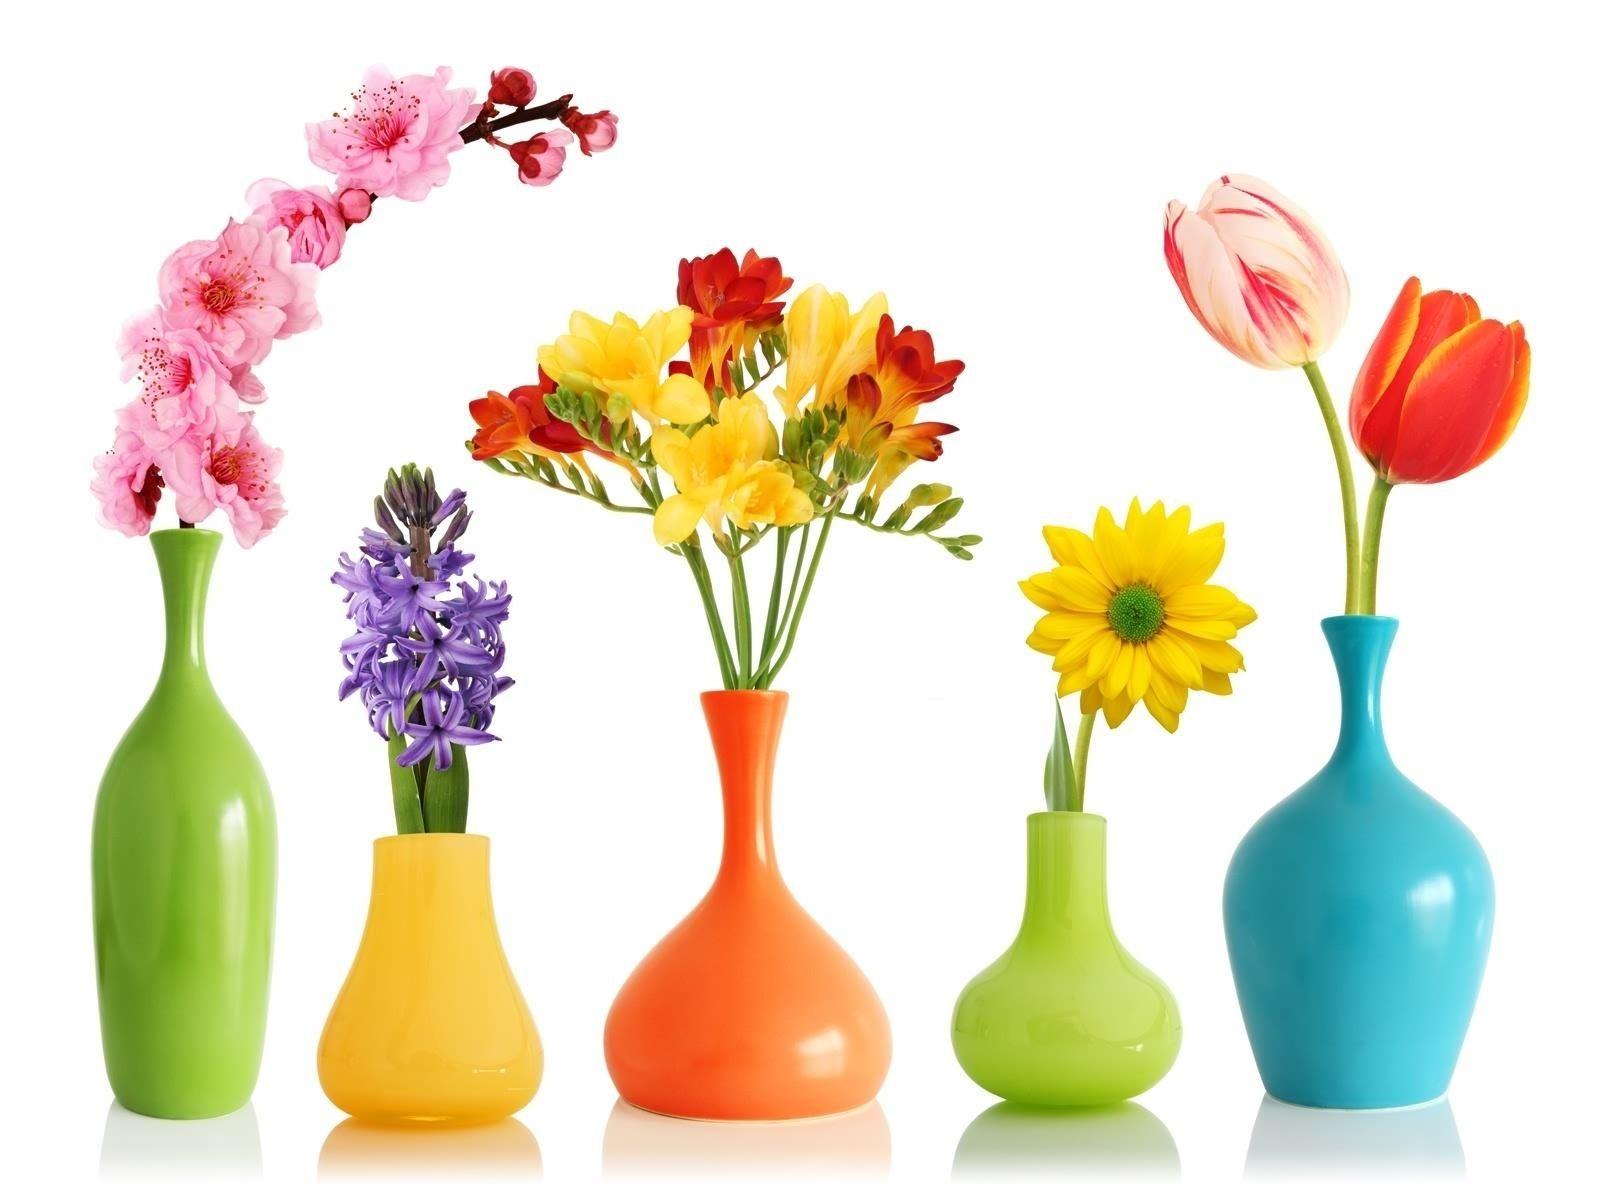 vase dream meaning, dream about vase, vase dream interpretation, seeing in a dream vase